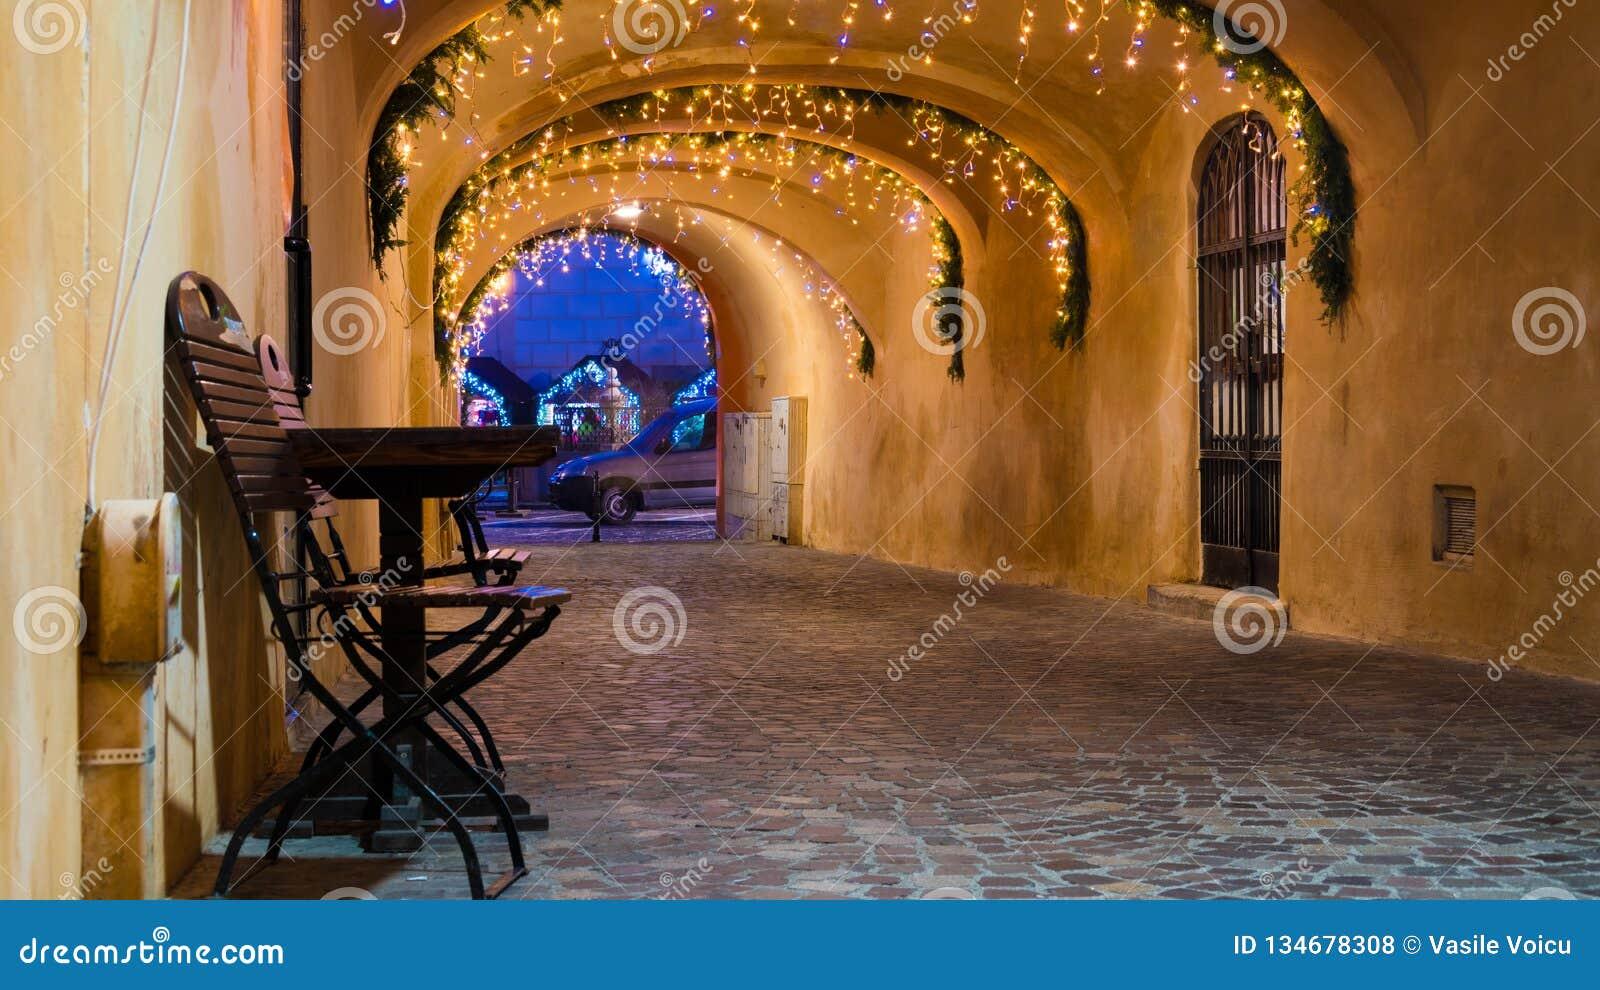 Street cafe at the night against city illumination lights